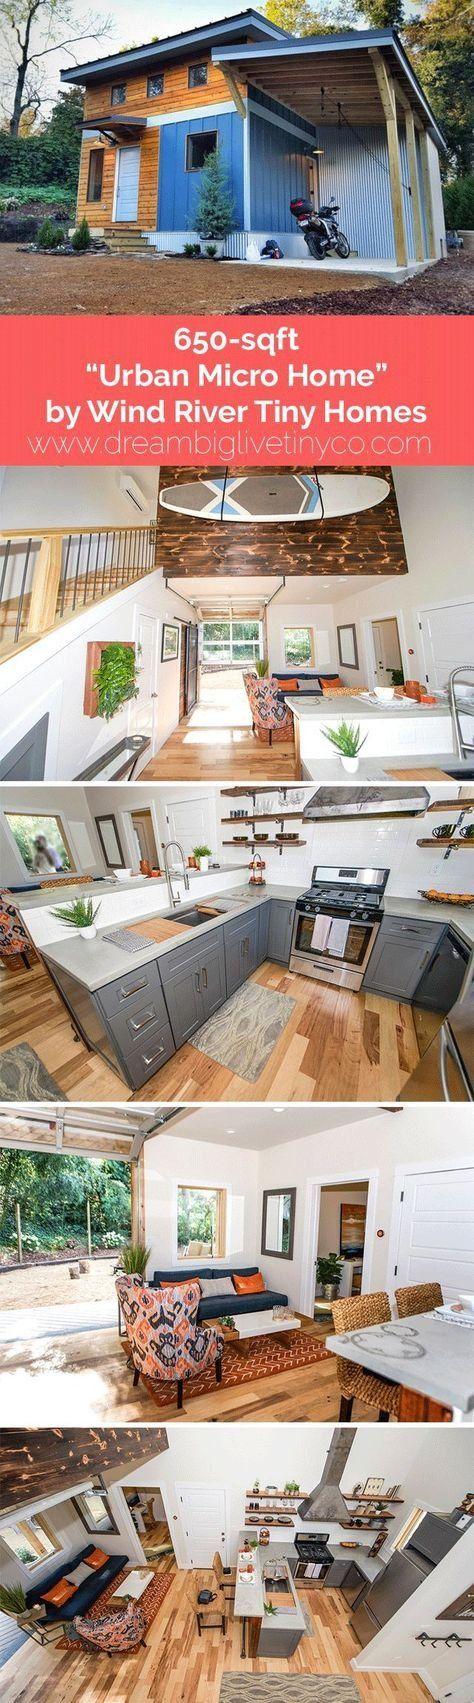 Photo of Bathroom Storage Ideas Diy Space Saving Tiny House 28  Ideas – Image 24 of 24 #bathroomstorageideas